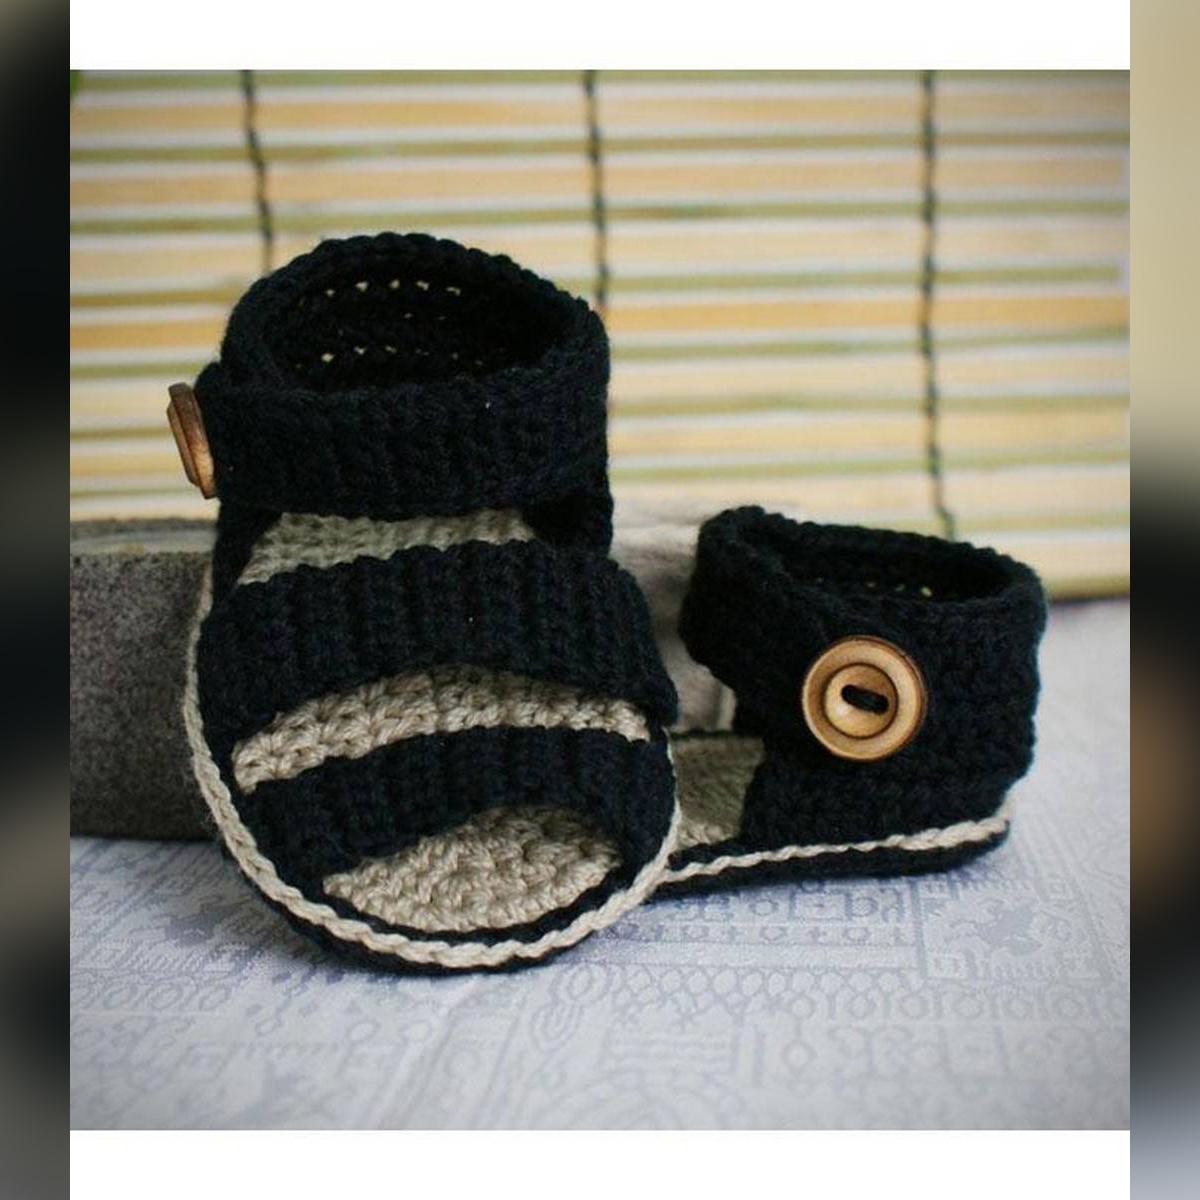 Stylish Black Woolen Handmade Crochet Baby Summer Sandal